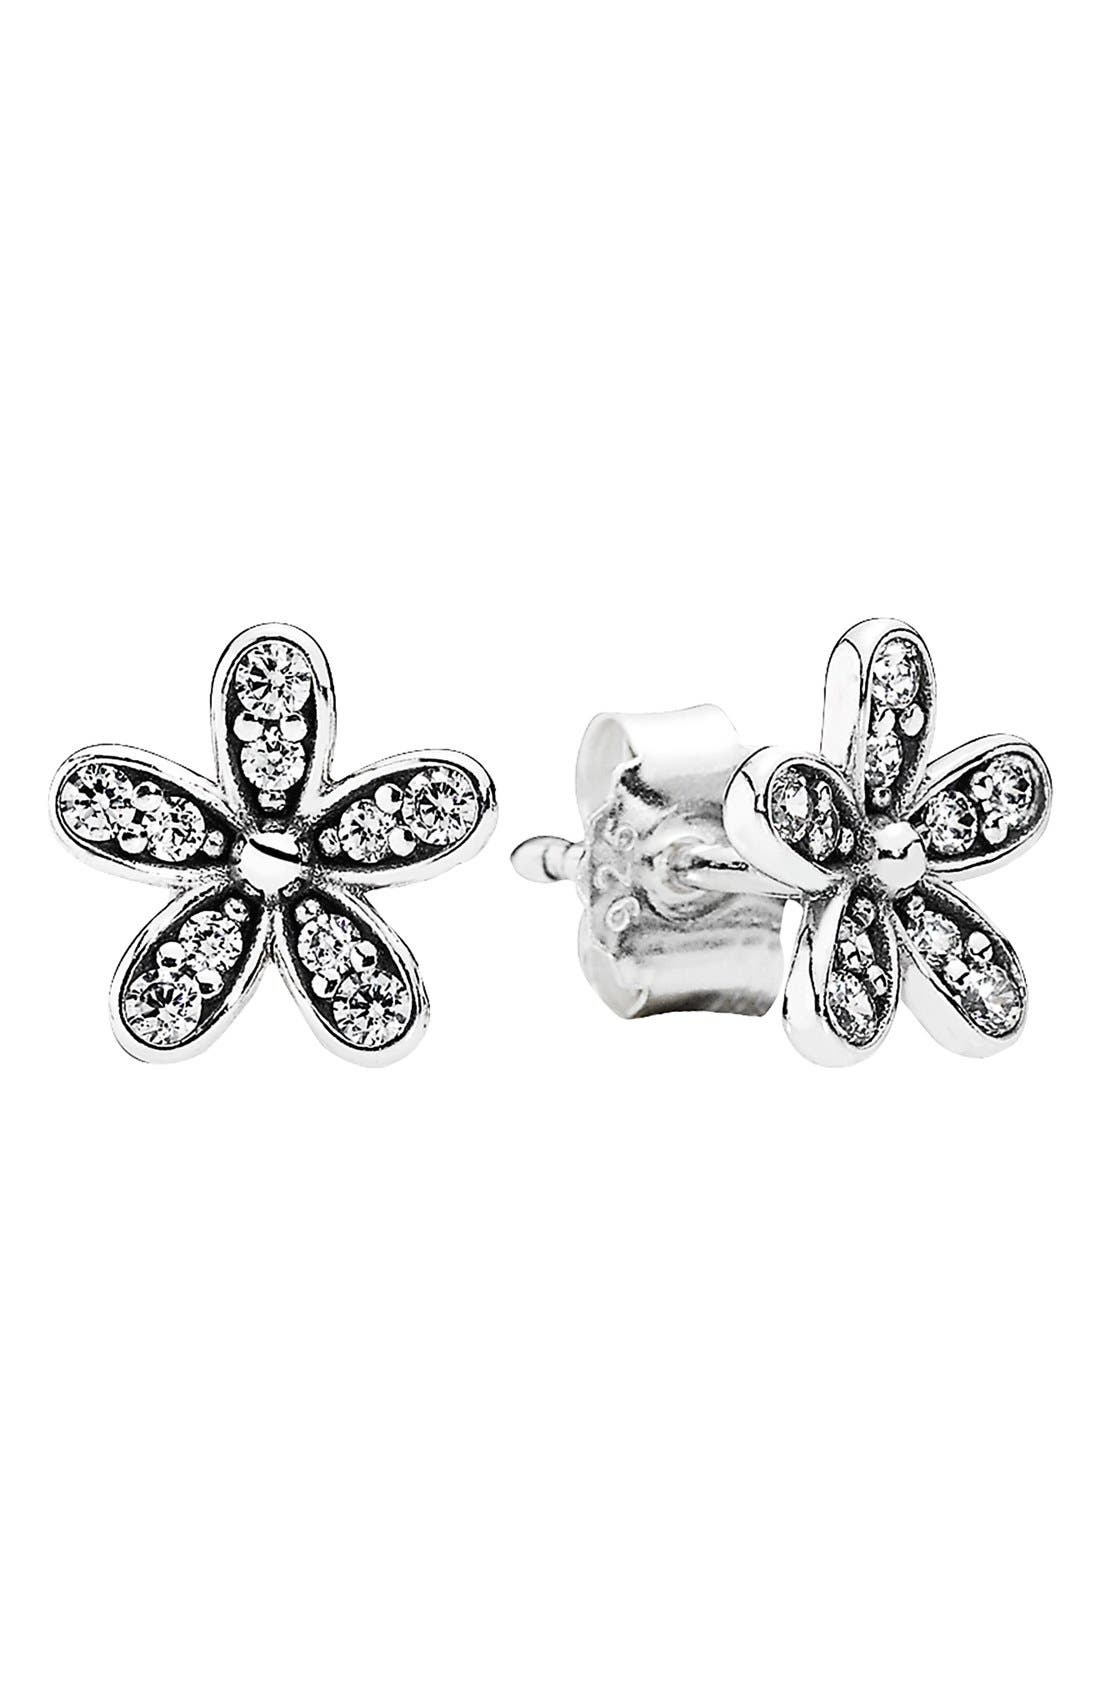 Main Image - PANDORA 'Dazzling Daisy' Mini Stud Earrings